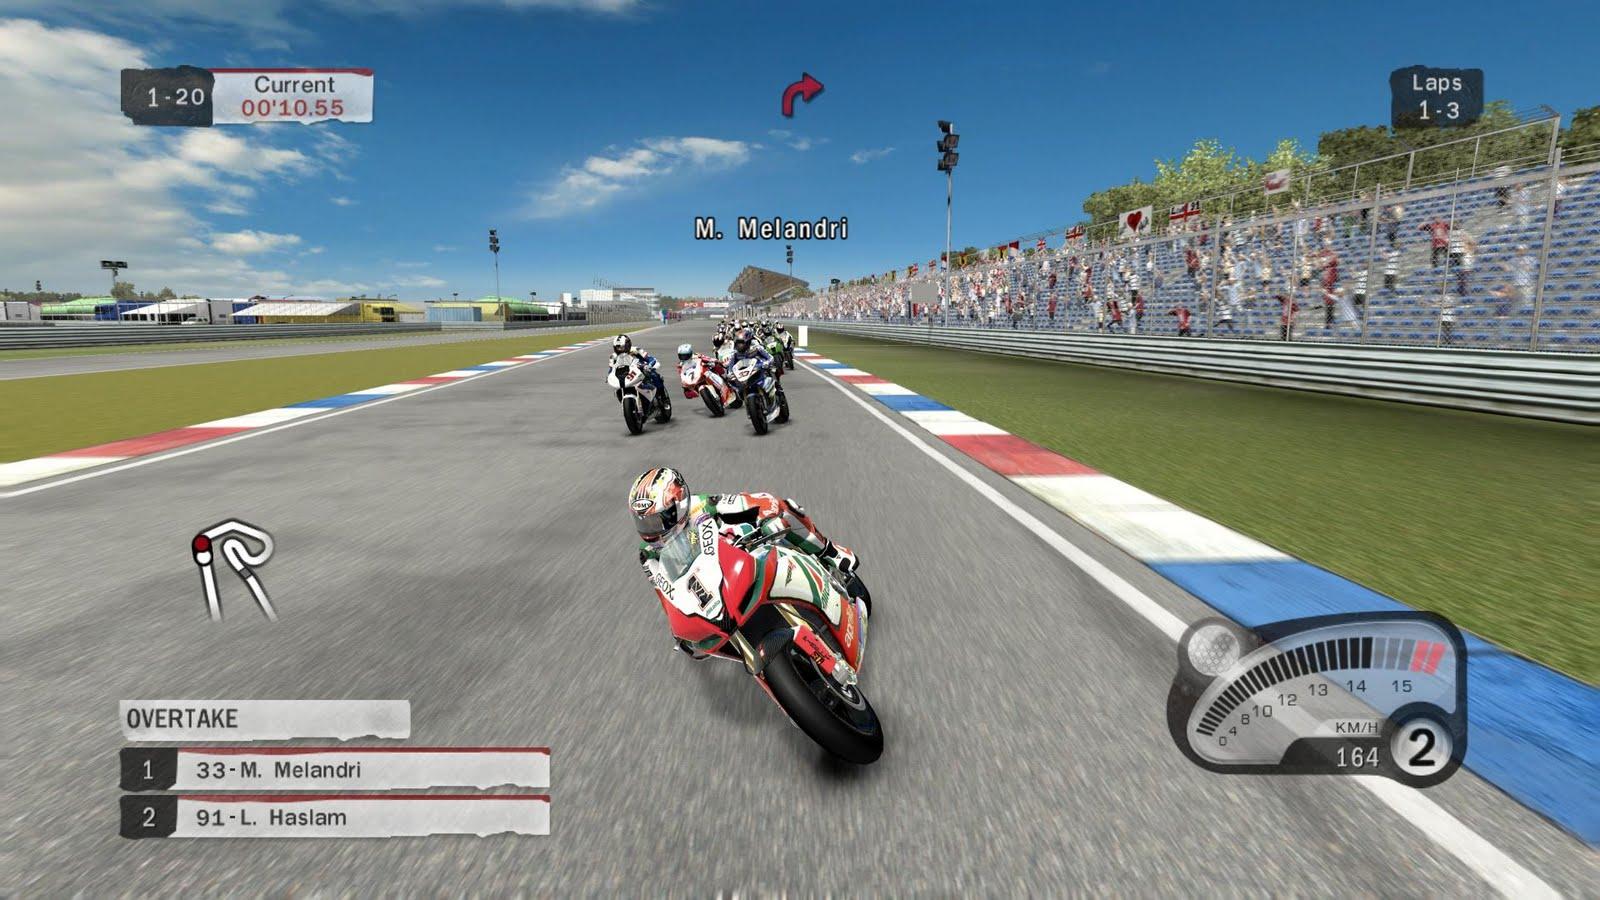 Novo jogo oficial da Ducati  Sbk2011+2011-05-01+19-10-54-17